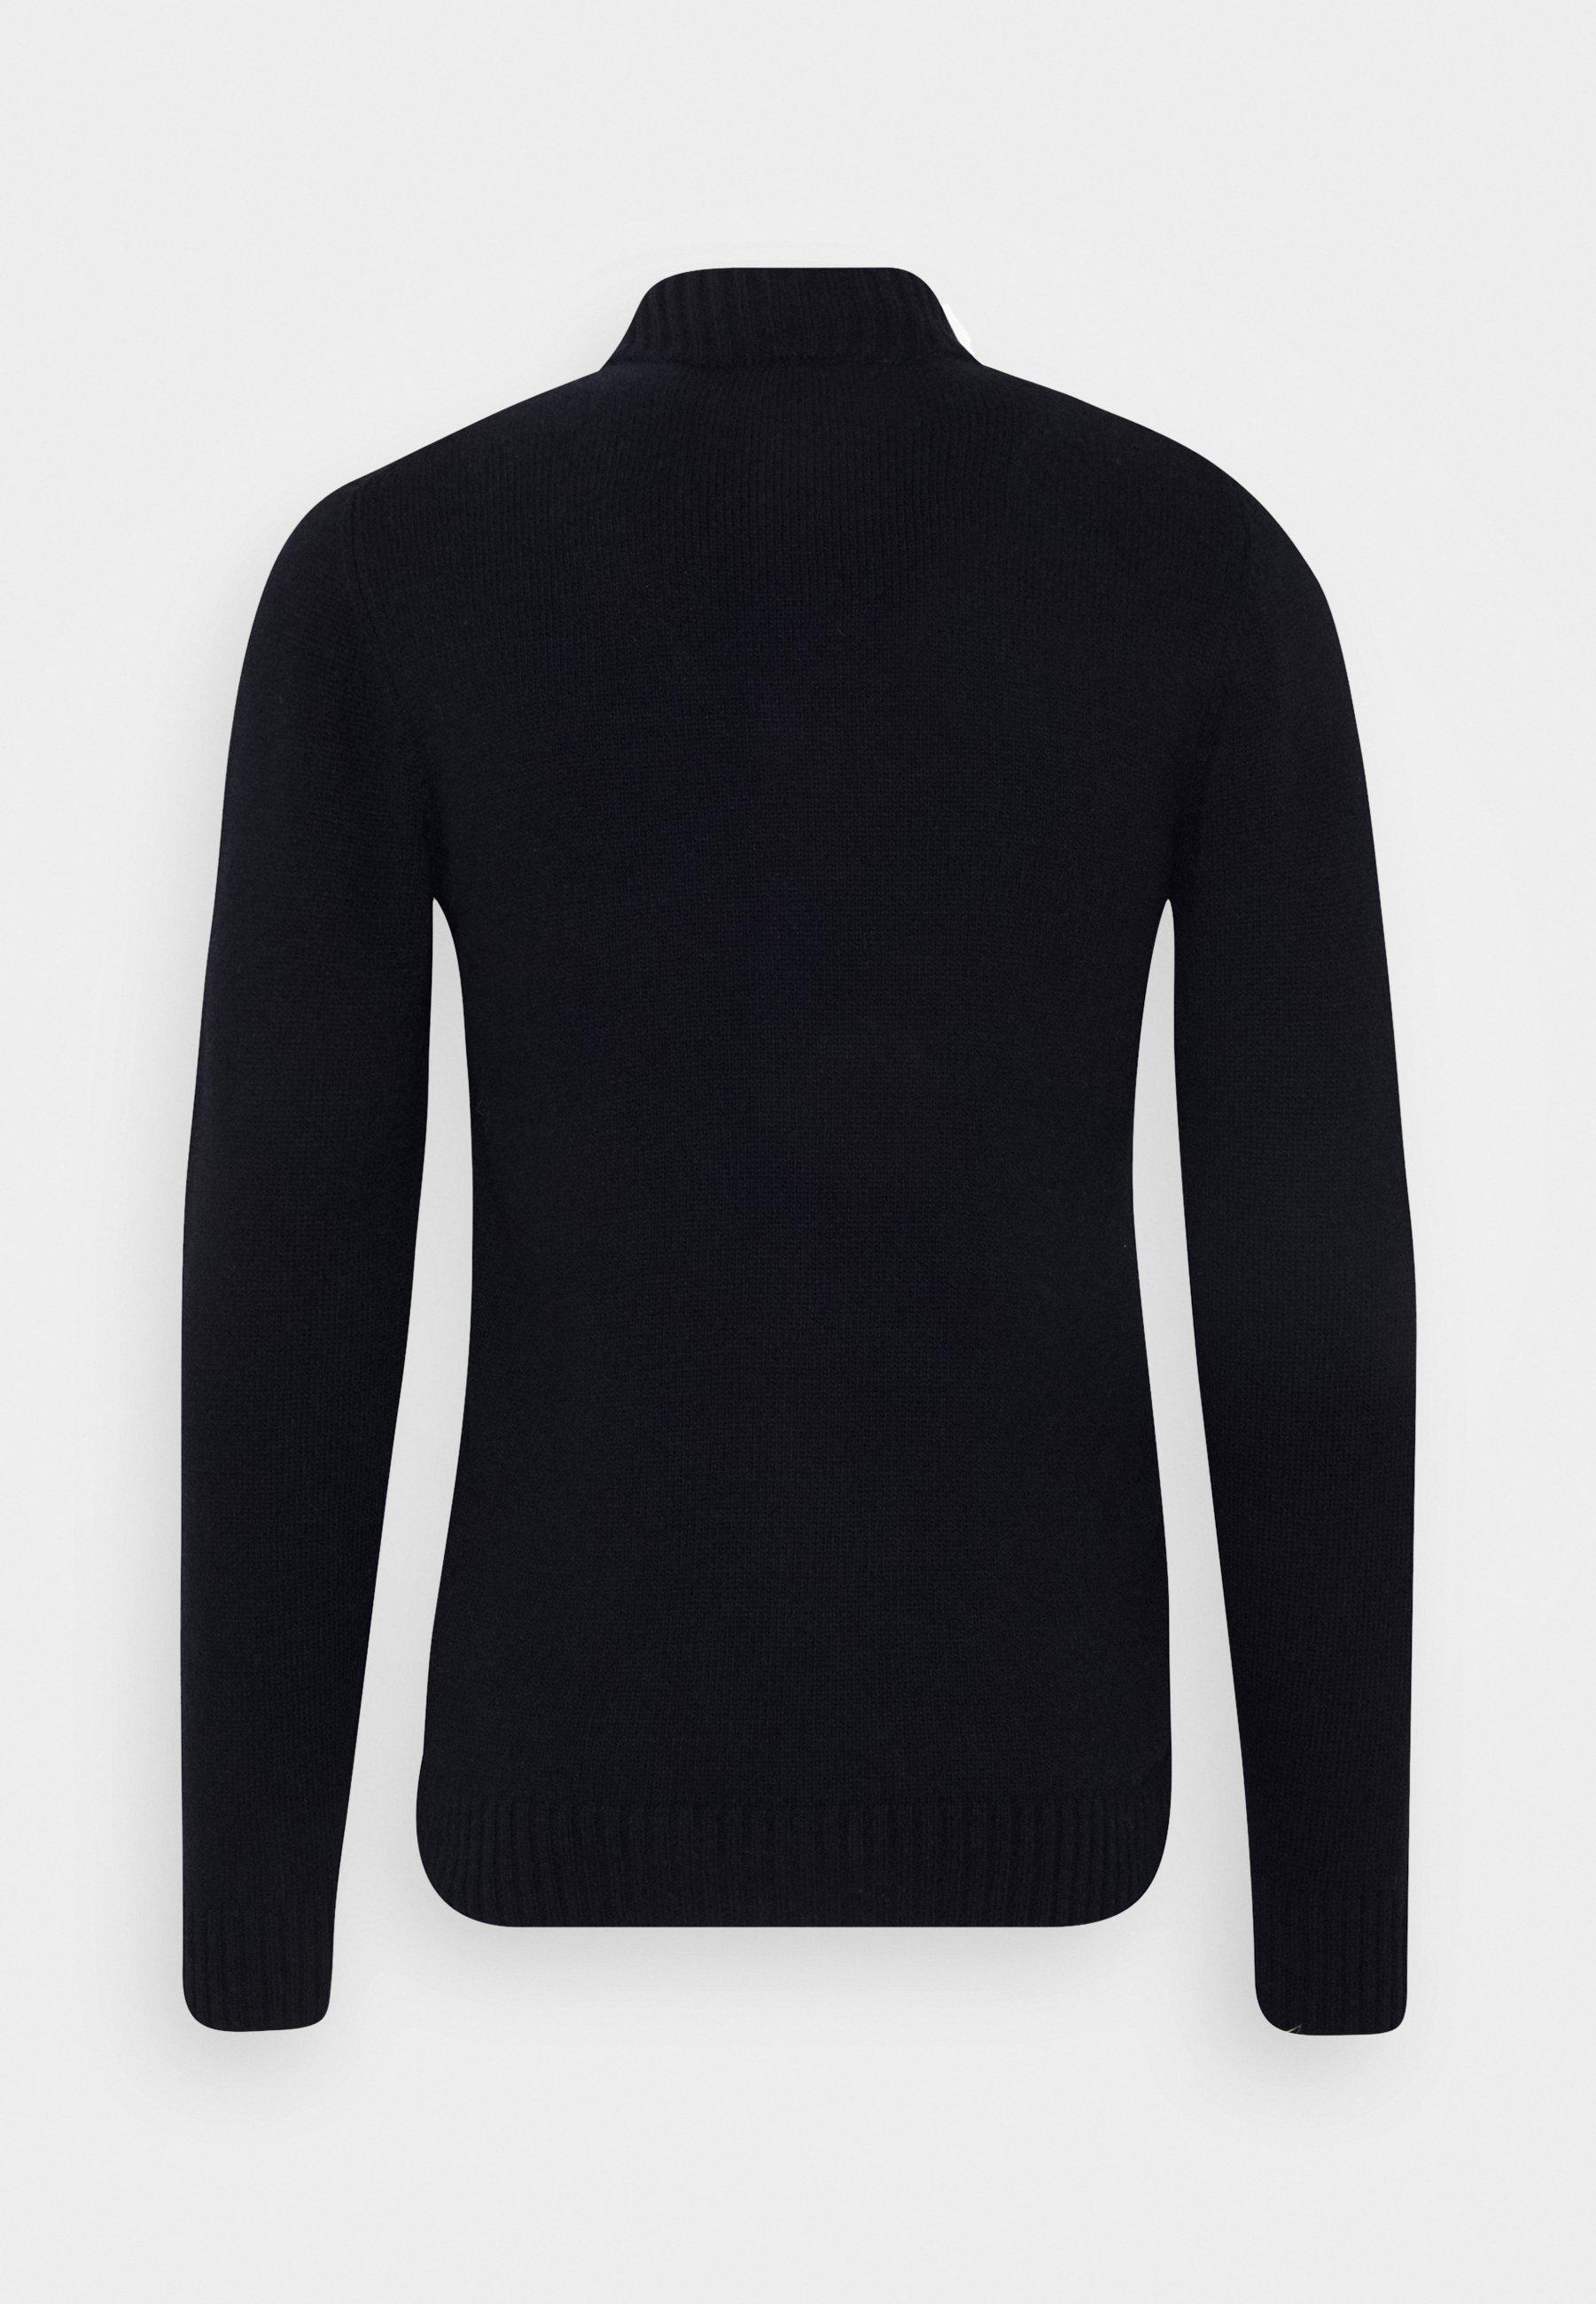 Wool & Co Cardigan - Strickjacke Navy